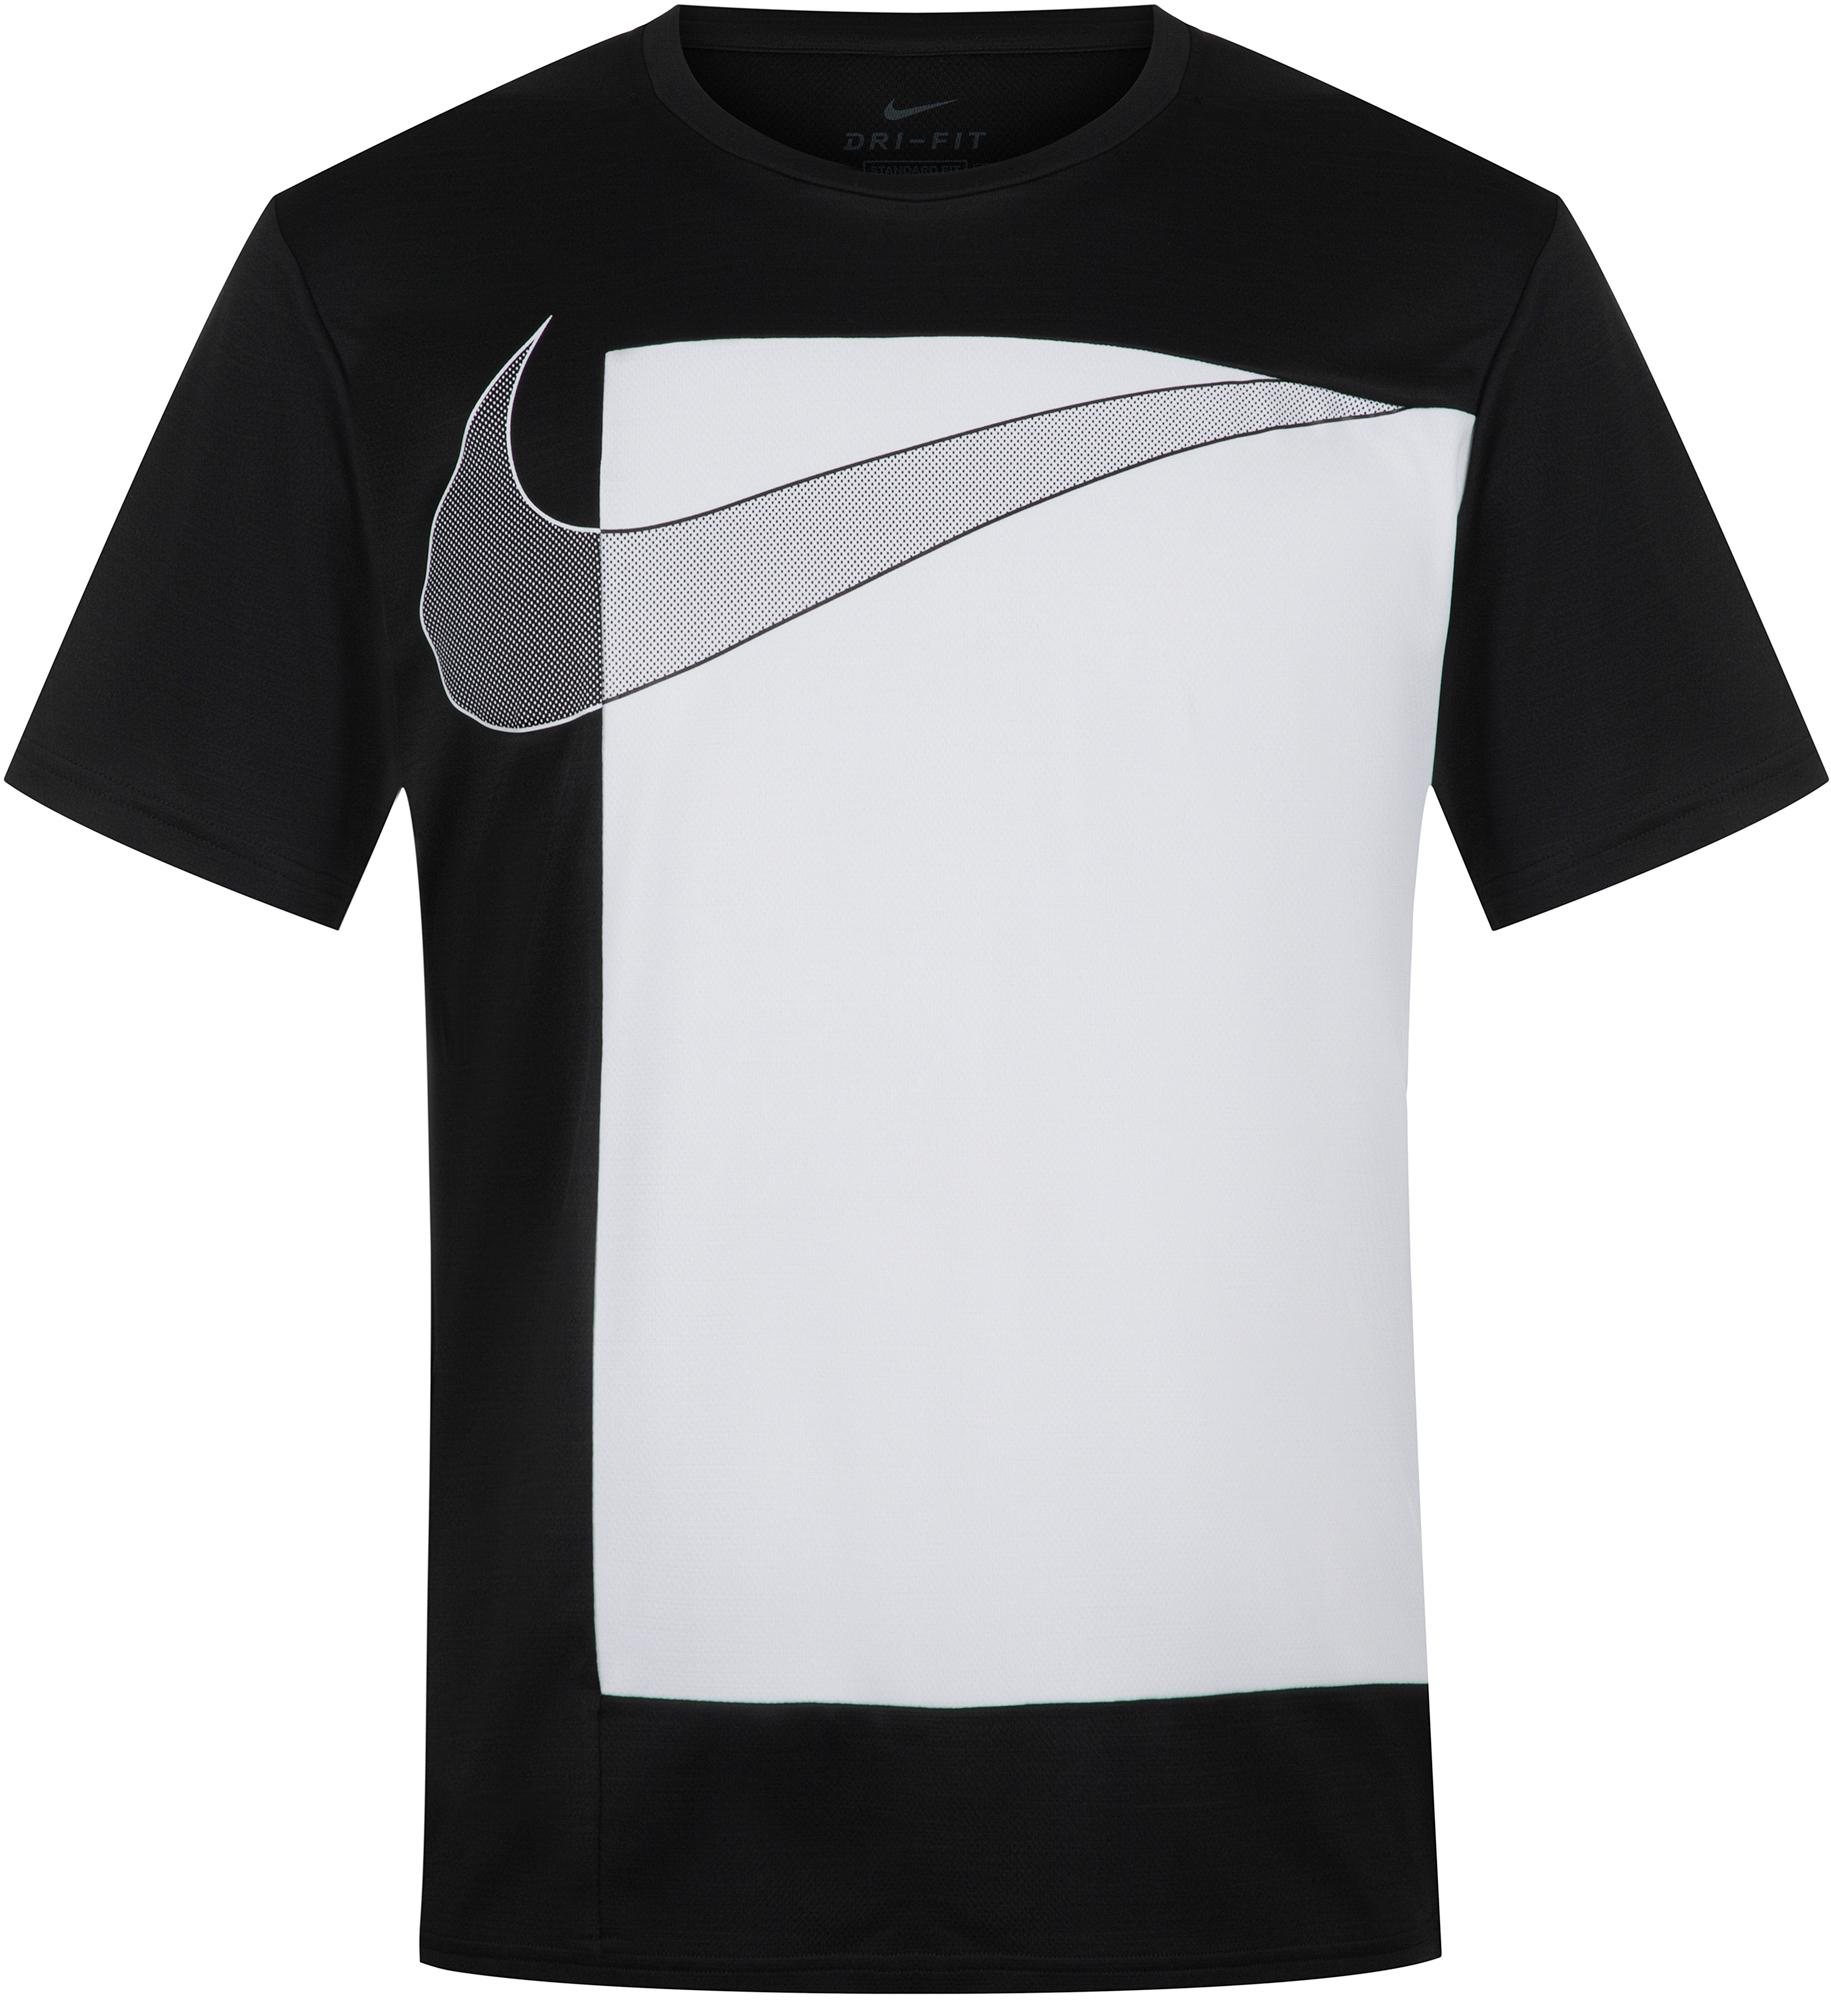 Nike Футболка мужская Nike Superset, размер 50-52 майка тренировочная ultrasport sr мужская